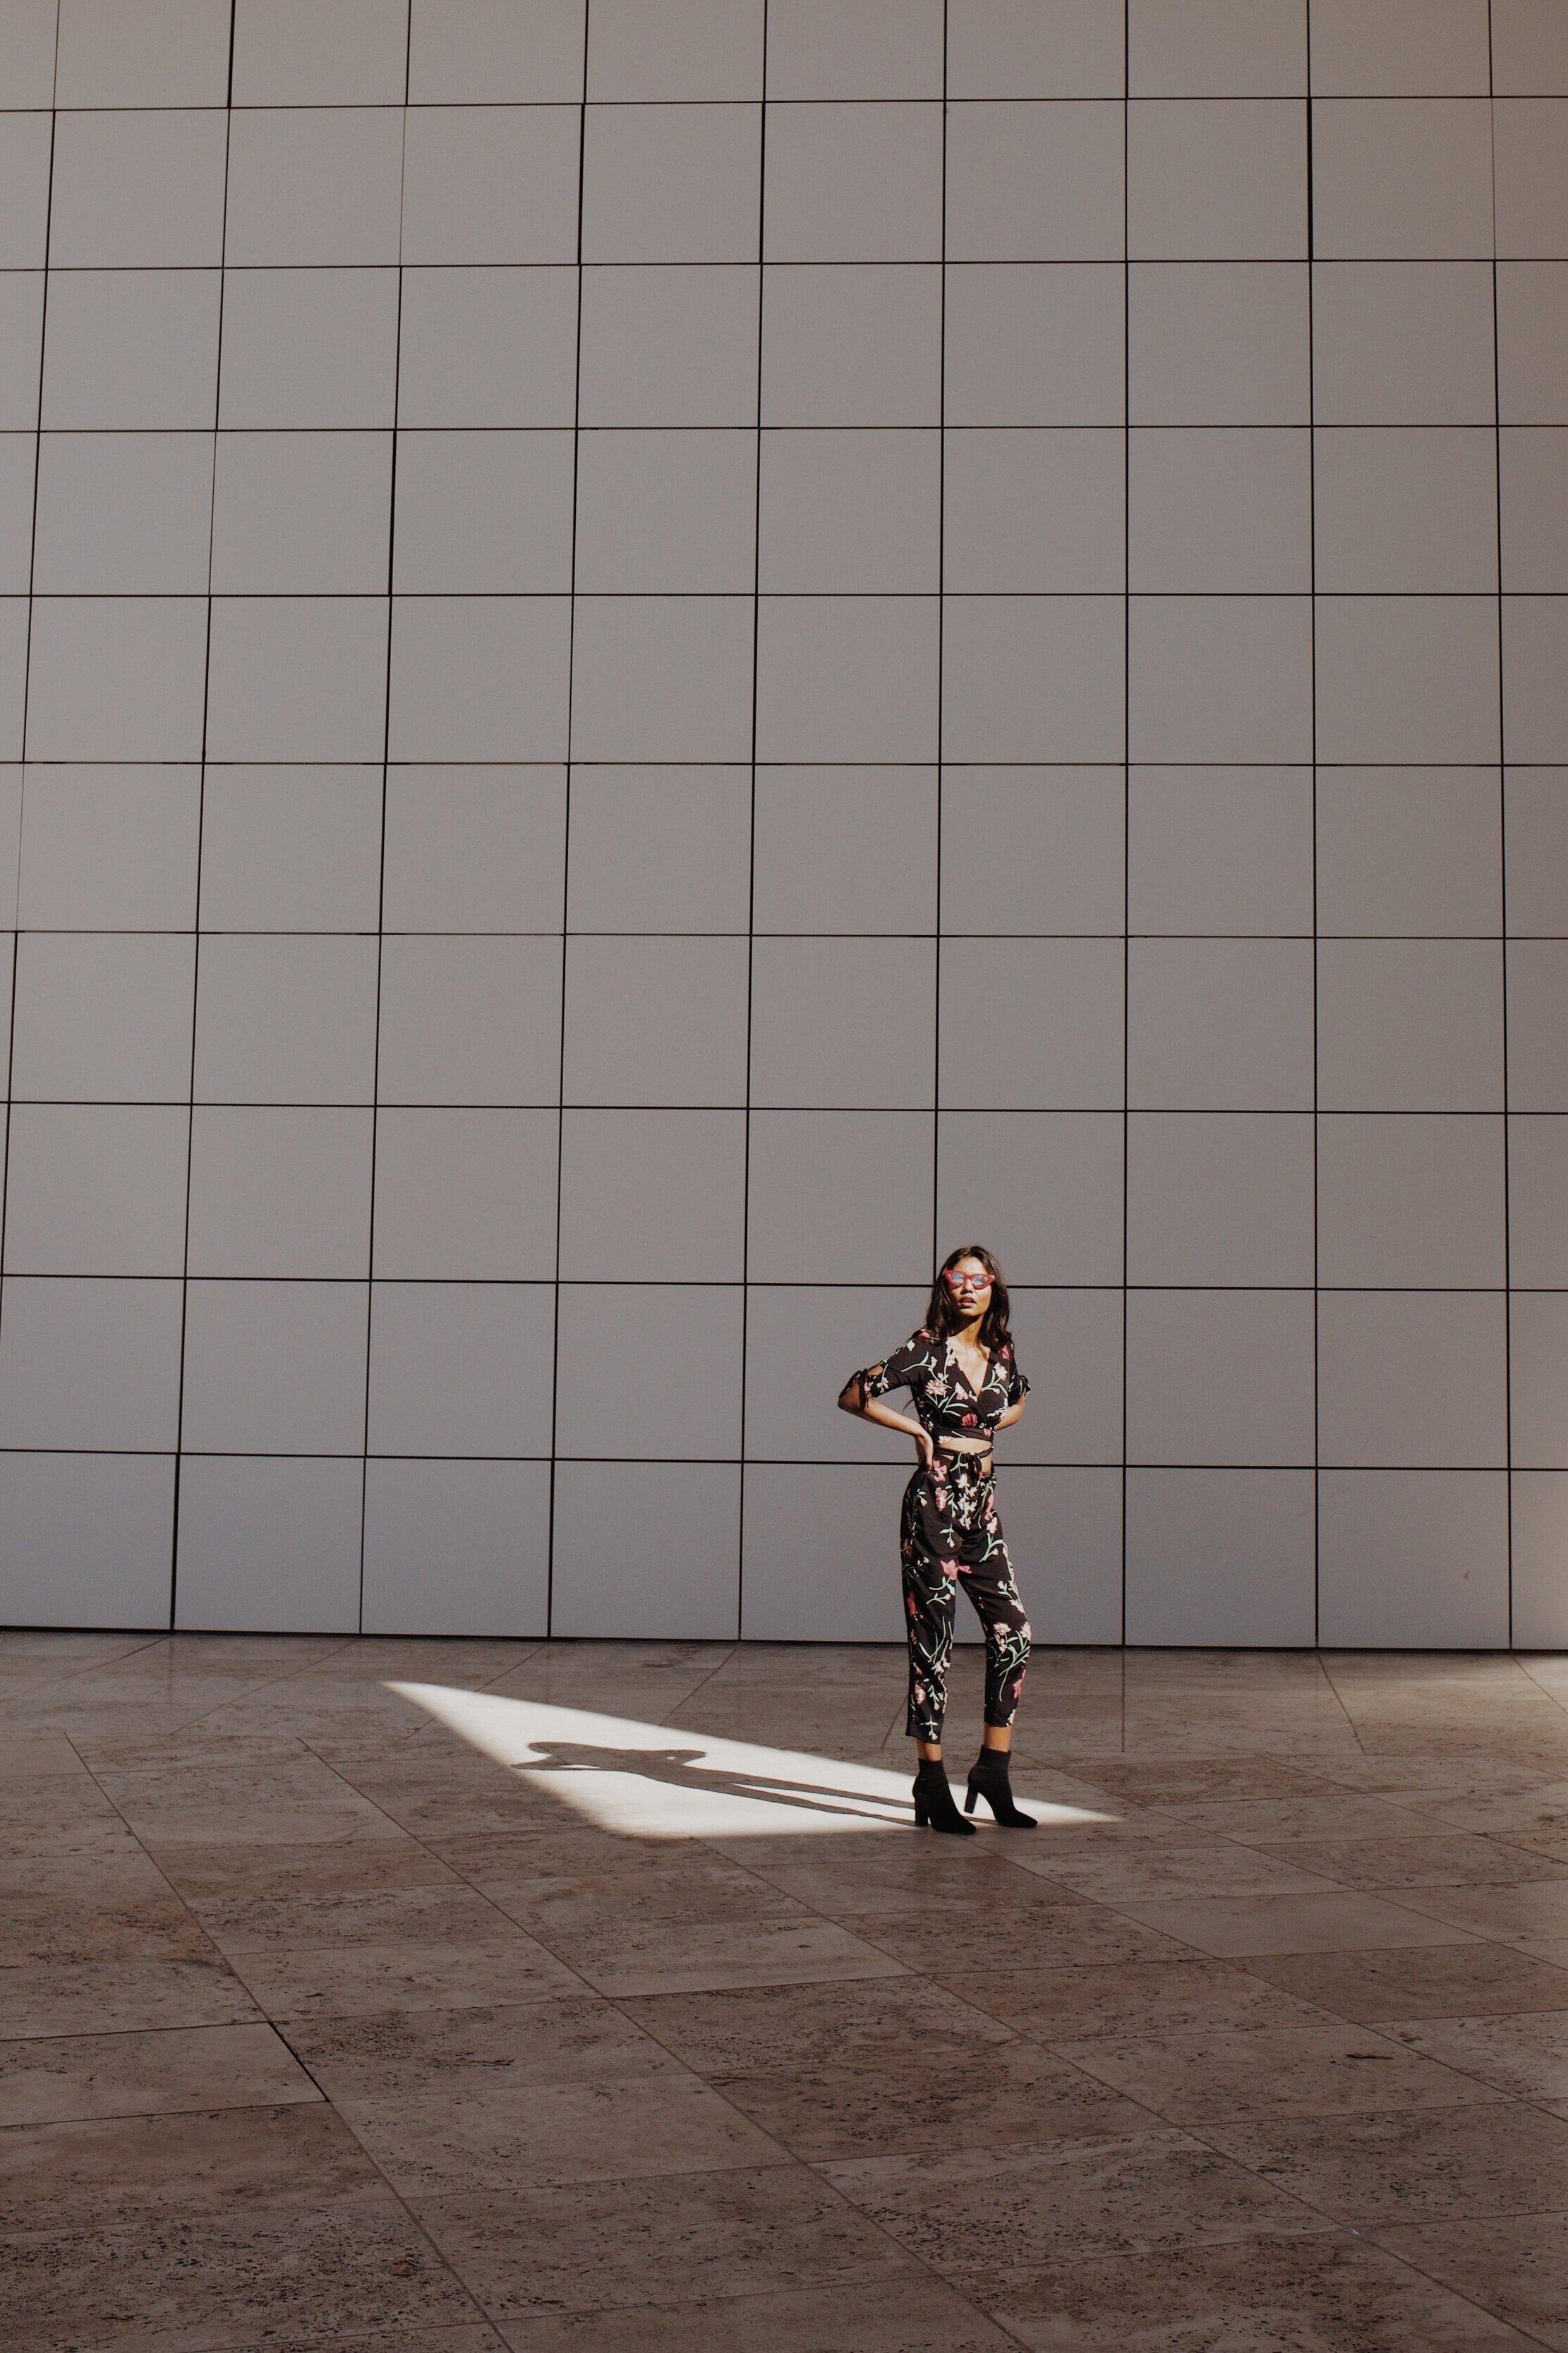 Getting Into Shape: Triangles  - Expert |  Carsten Frauenheim